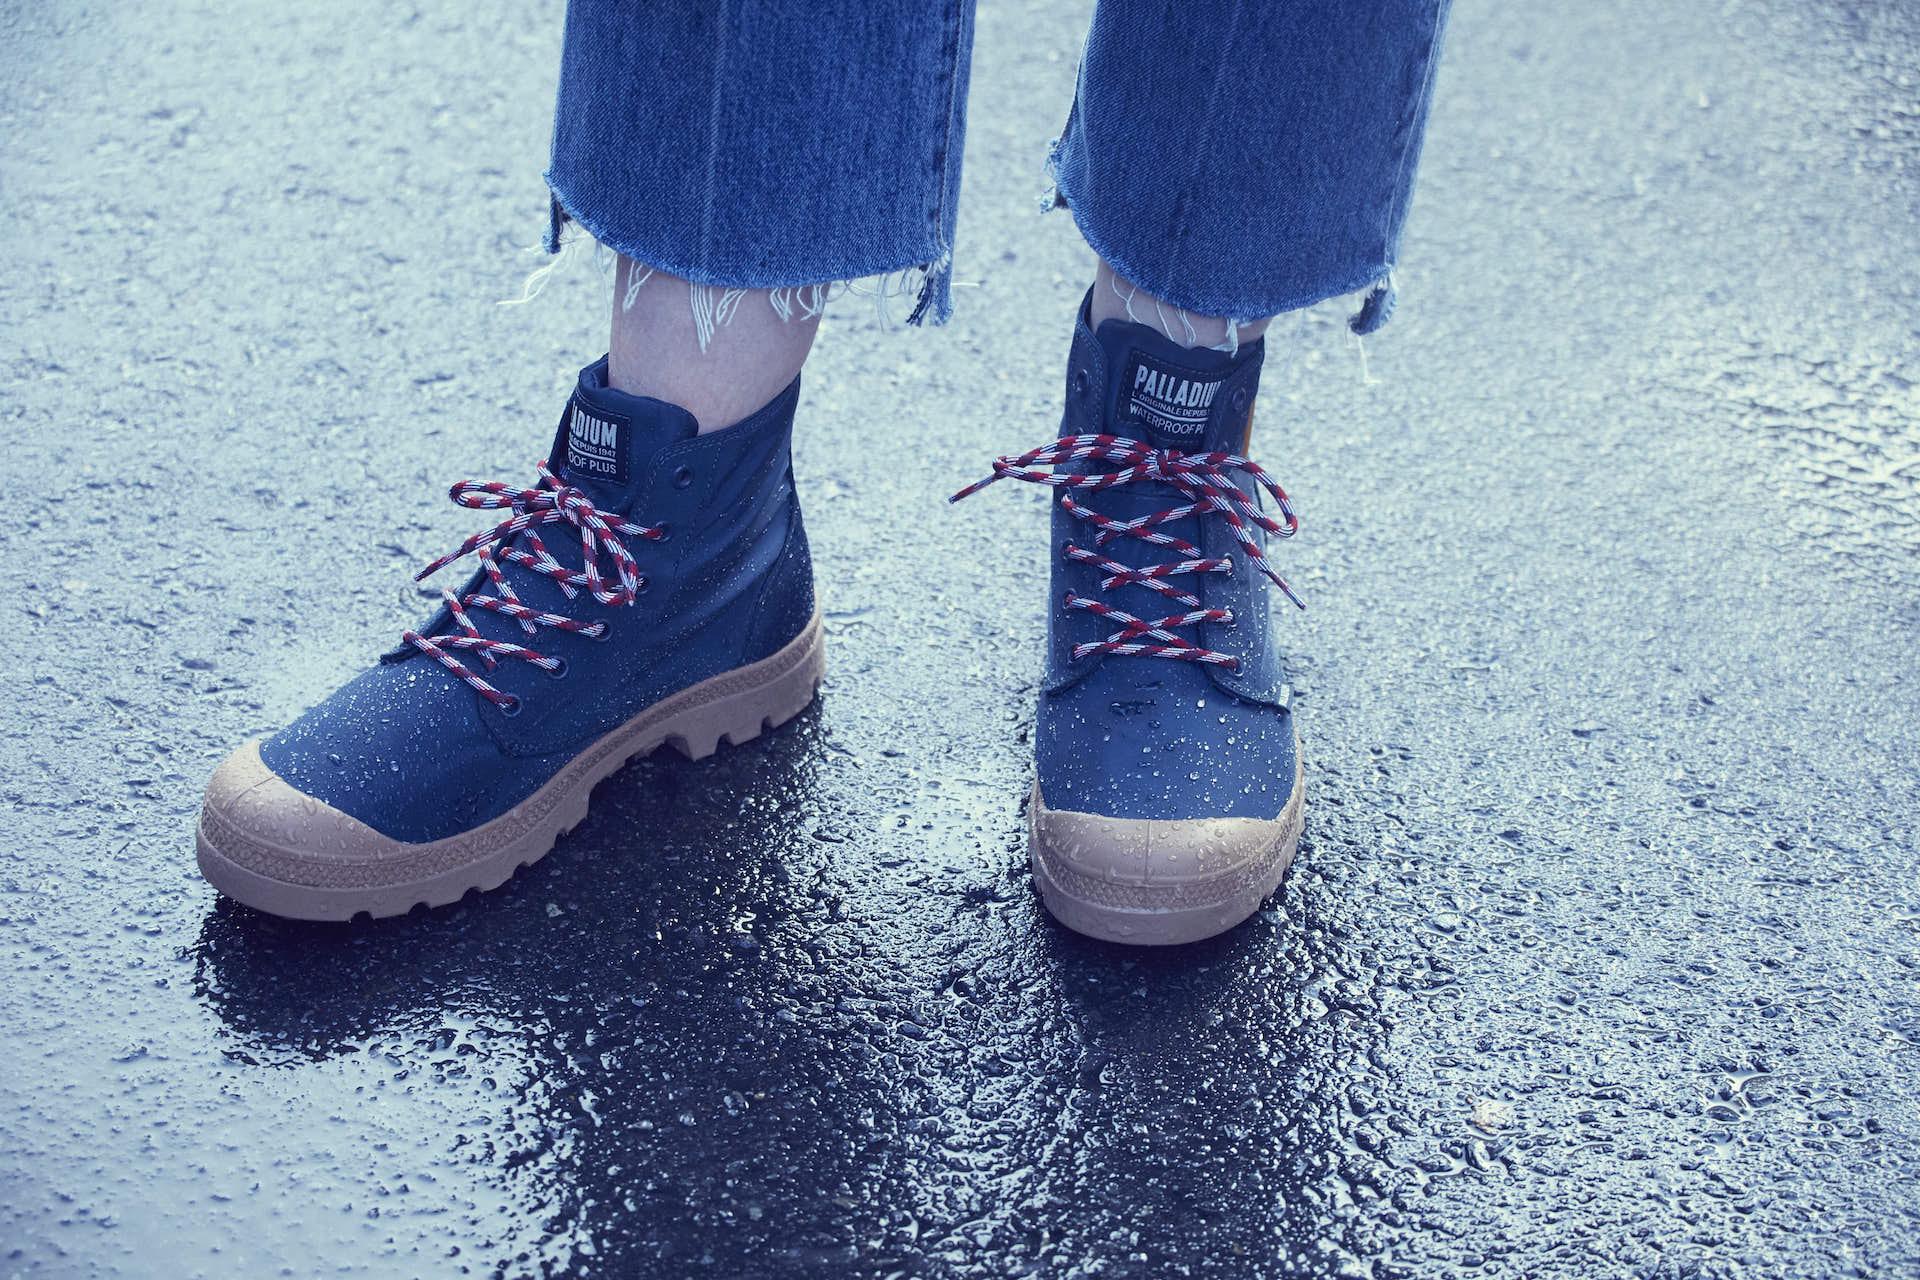 PALLADIUM徹底解剖|雨の日やアウトドア/フェスで大活躍するおしゃれな防水靴の秘密 life-fashion190704-palladium-7